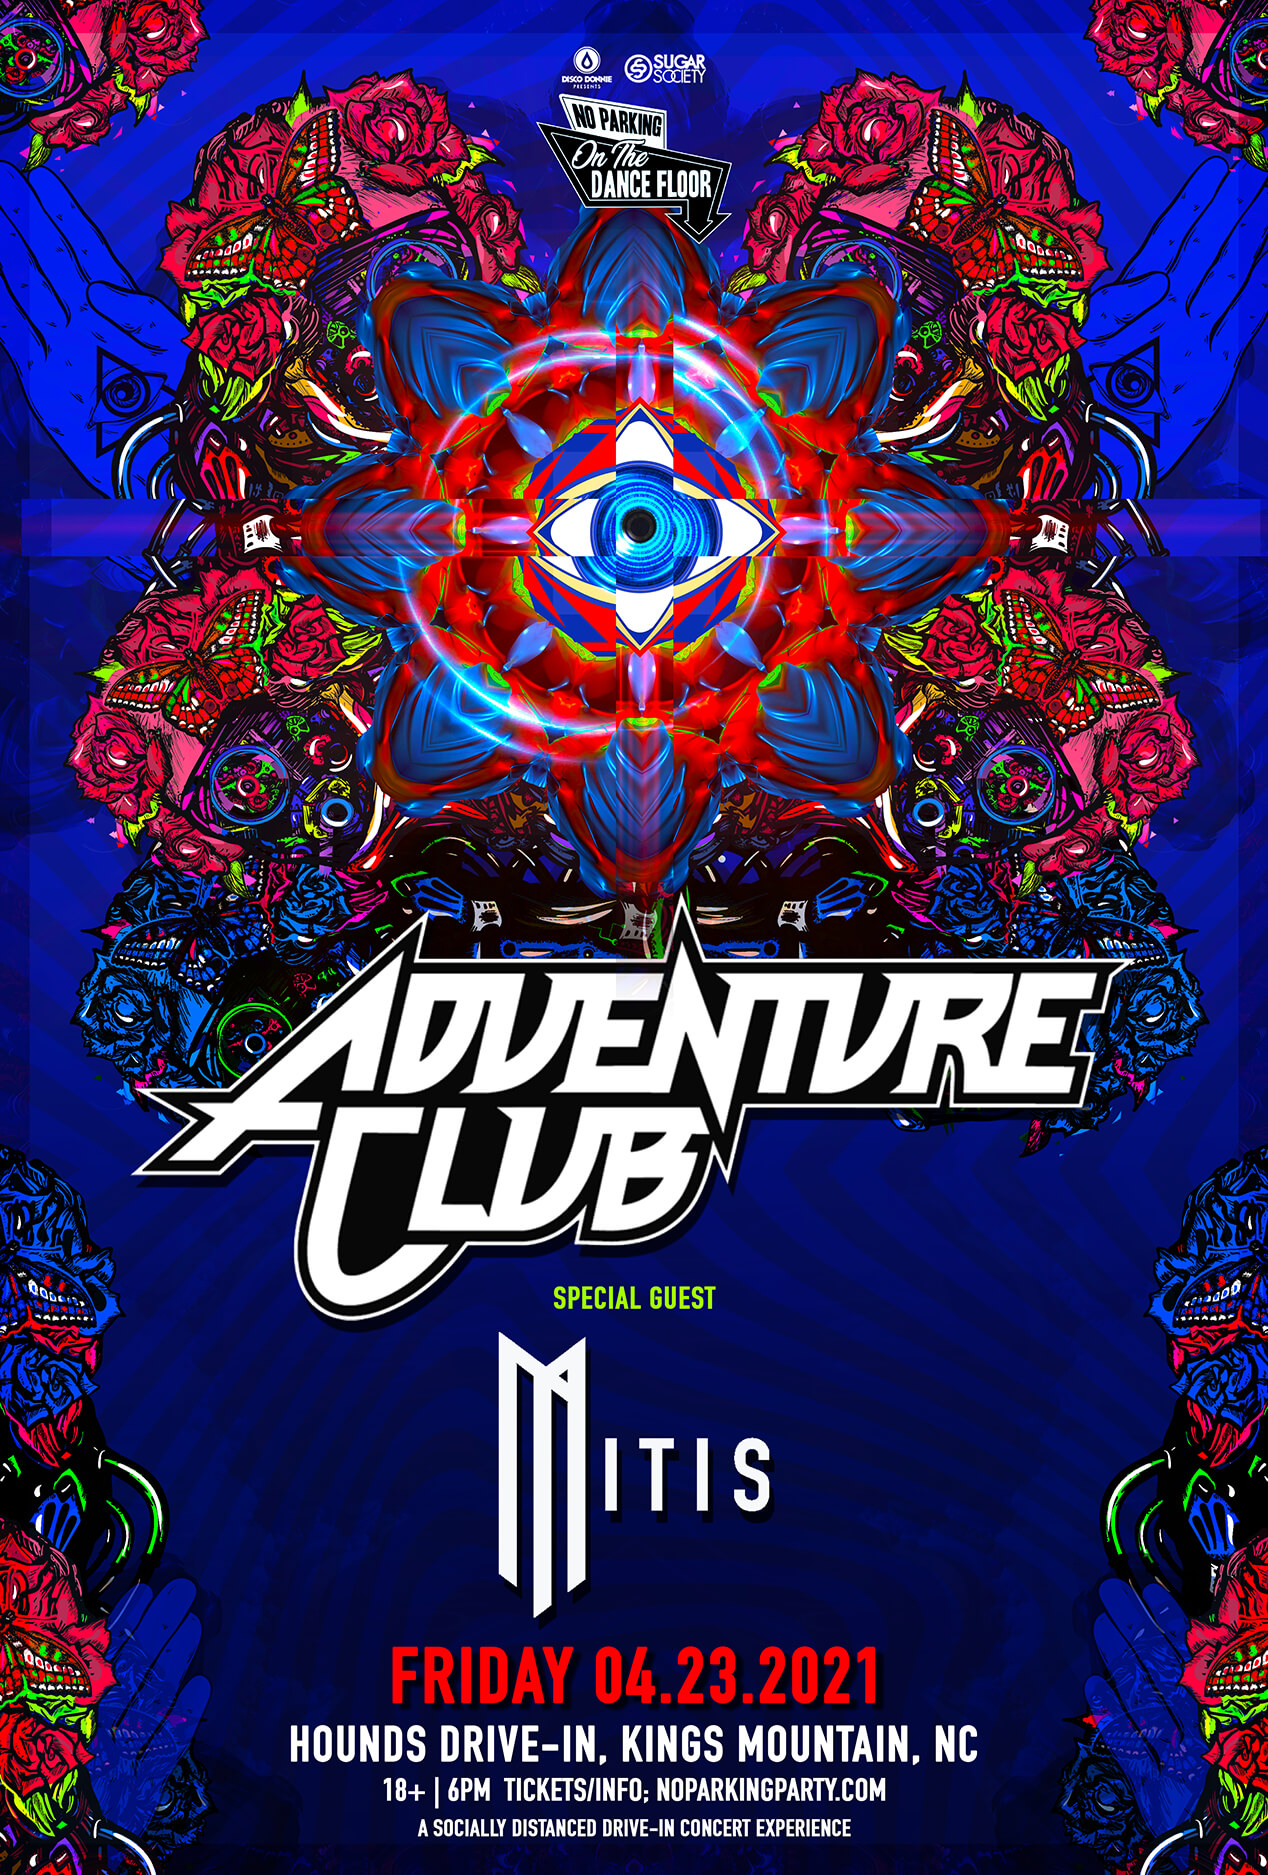 Adventure Club, MitiS in Kings Mountain